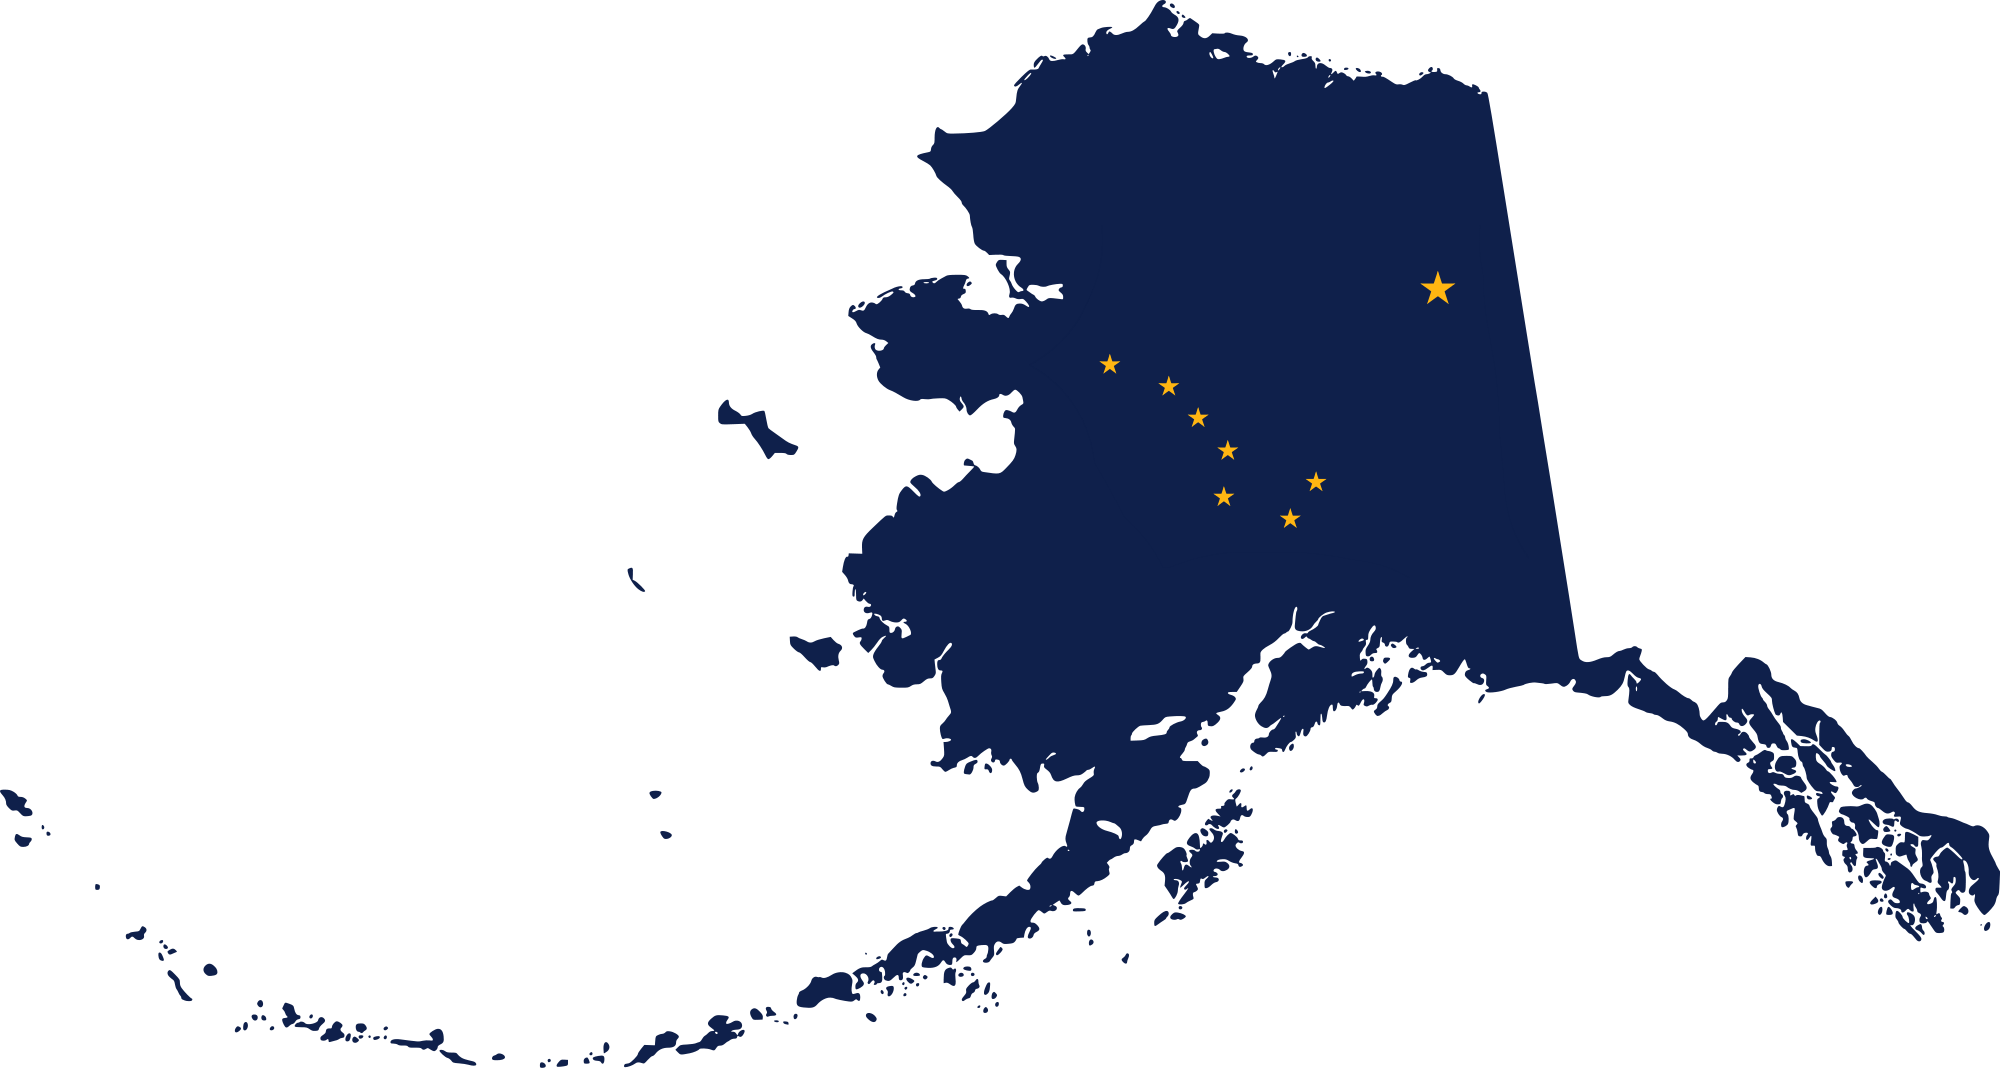 File:Flag map of Alaska.png.